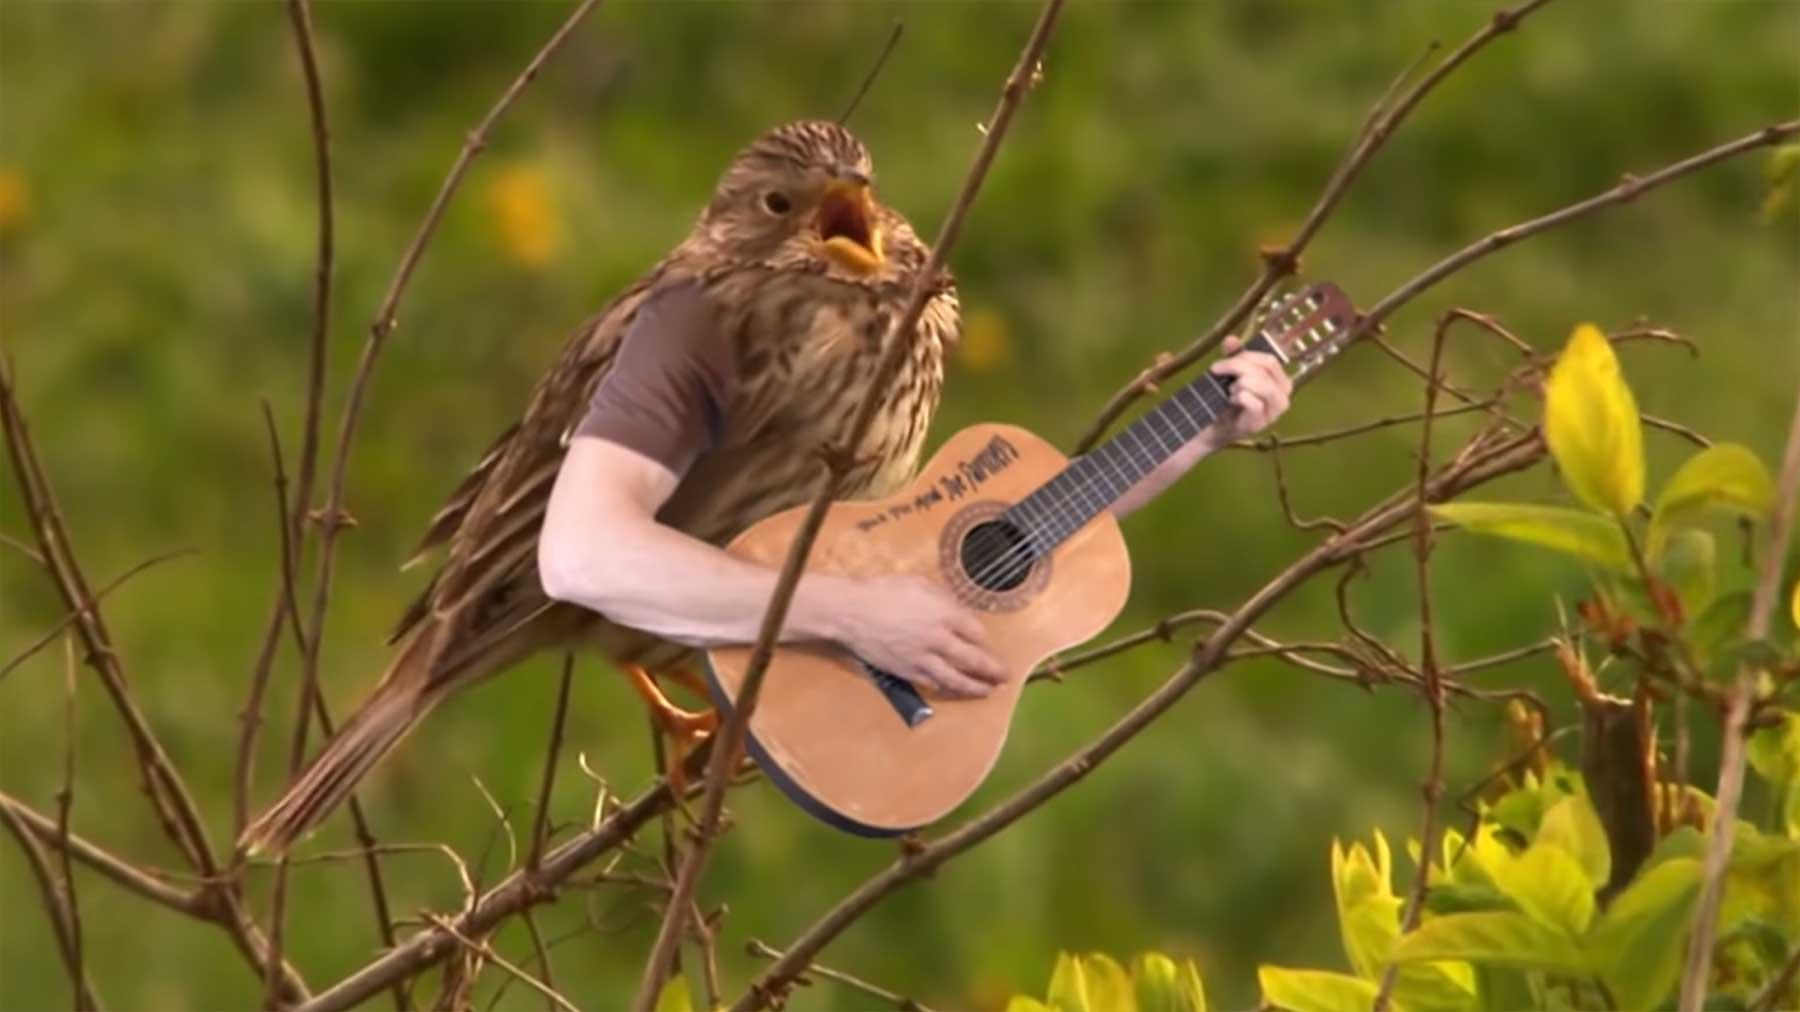 Wenn Vögel Arme hätten... voegel-mit-armen-video